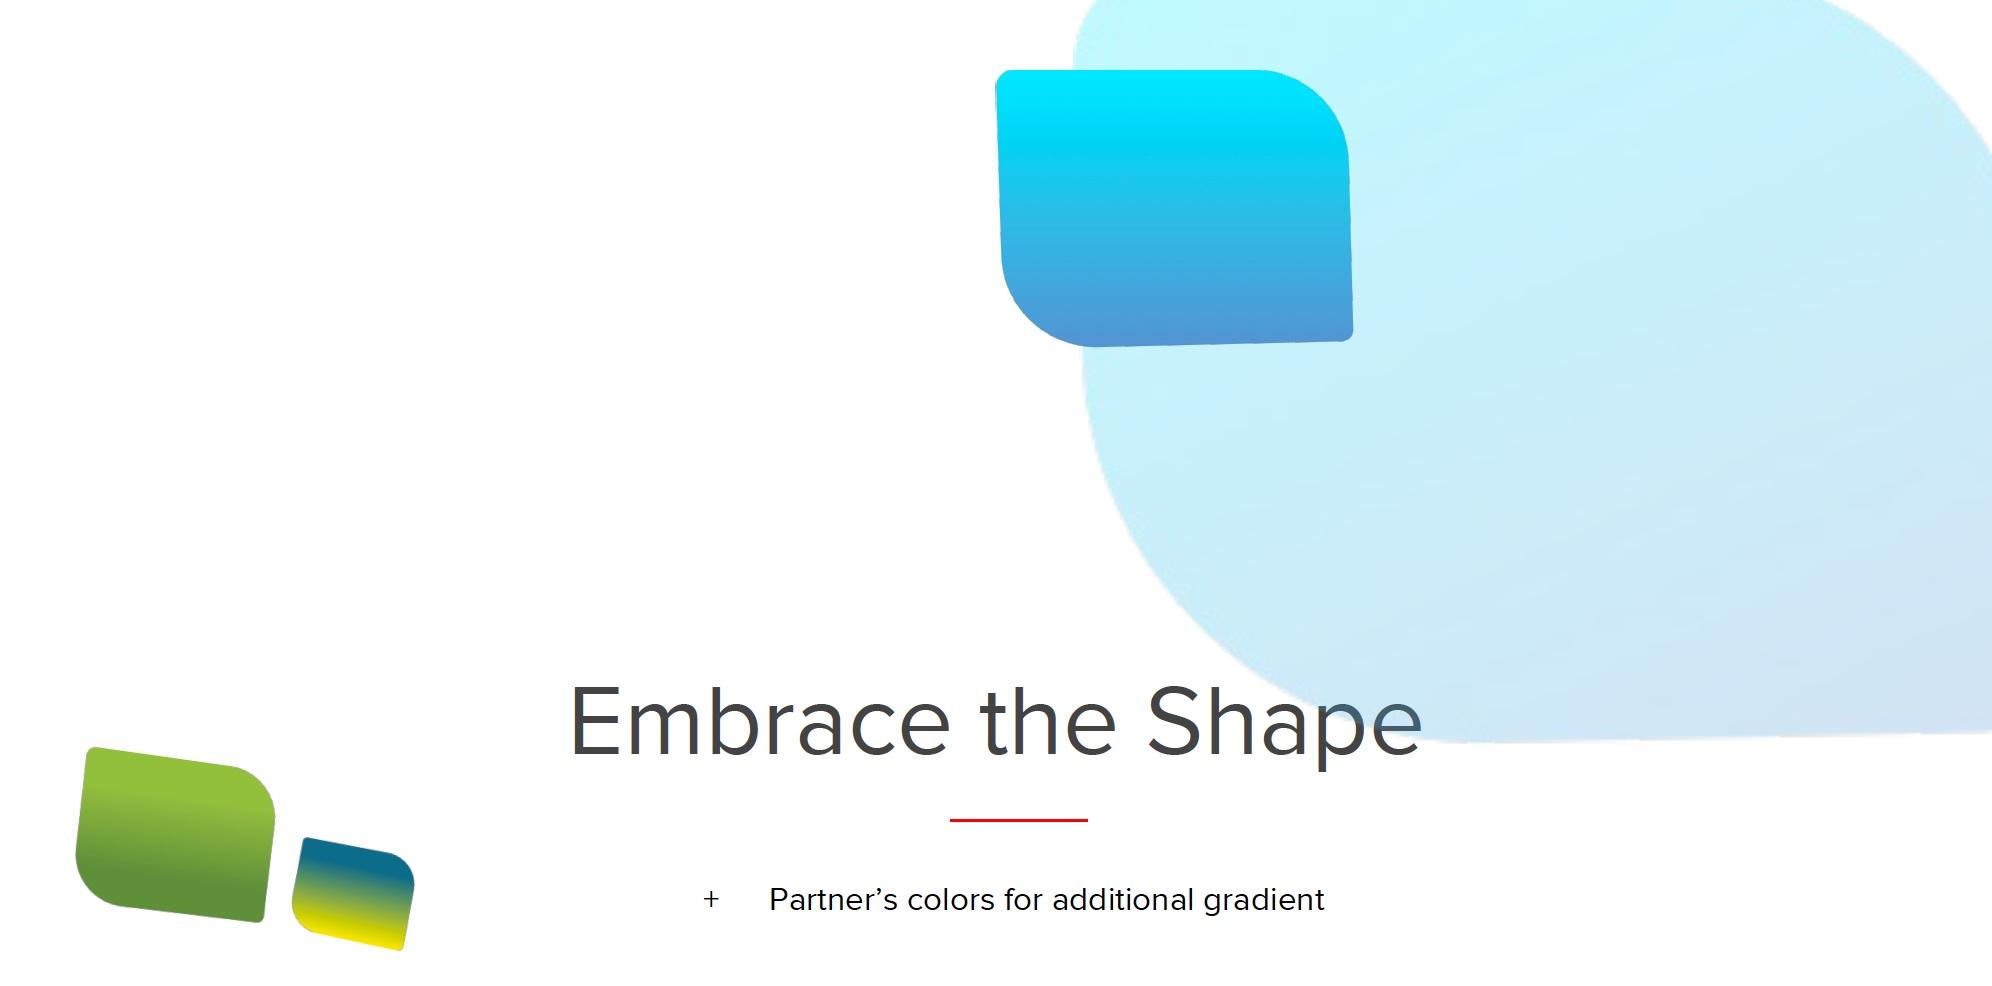 Embrace the shapre